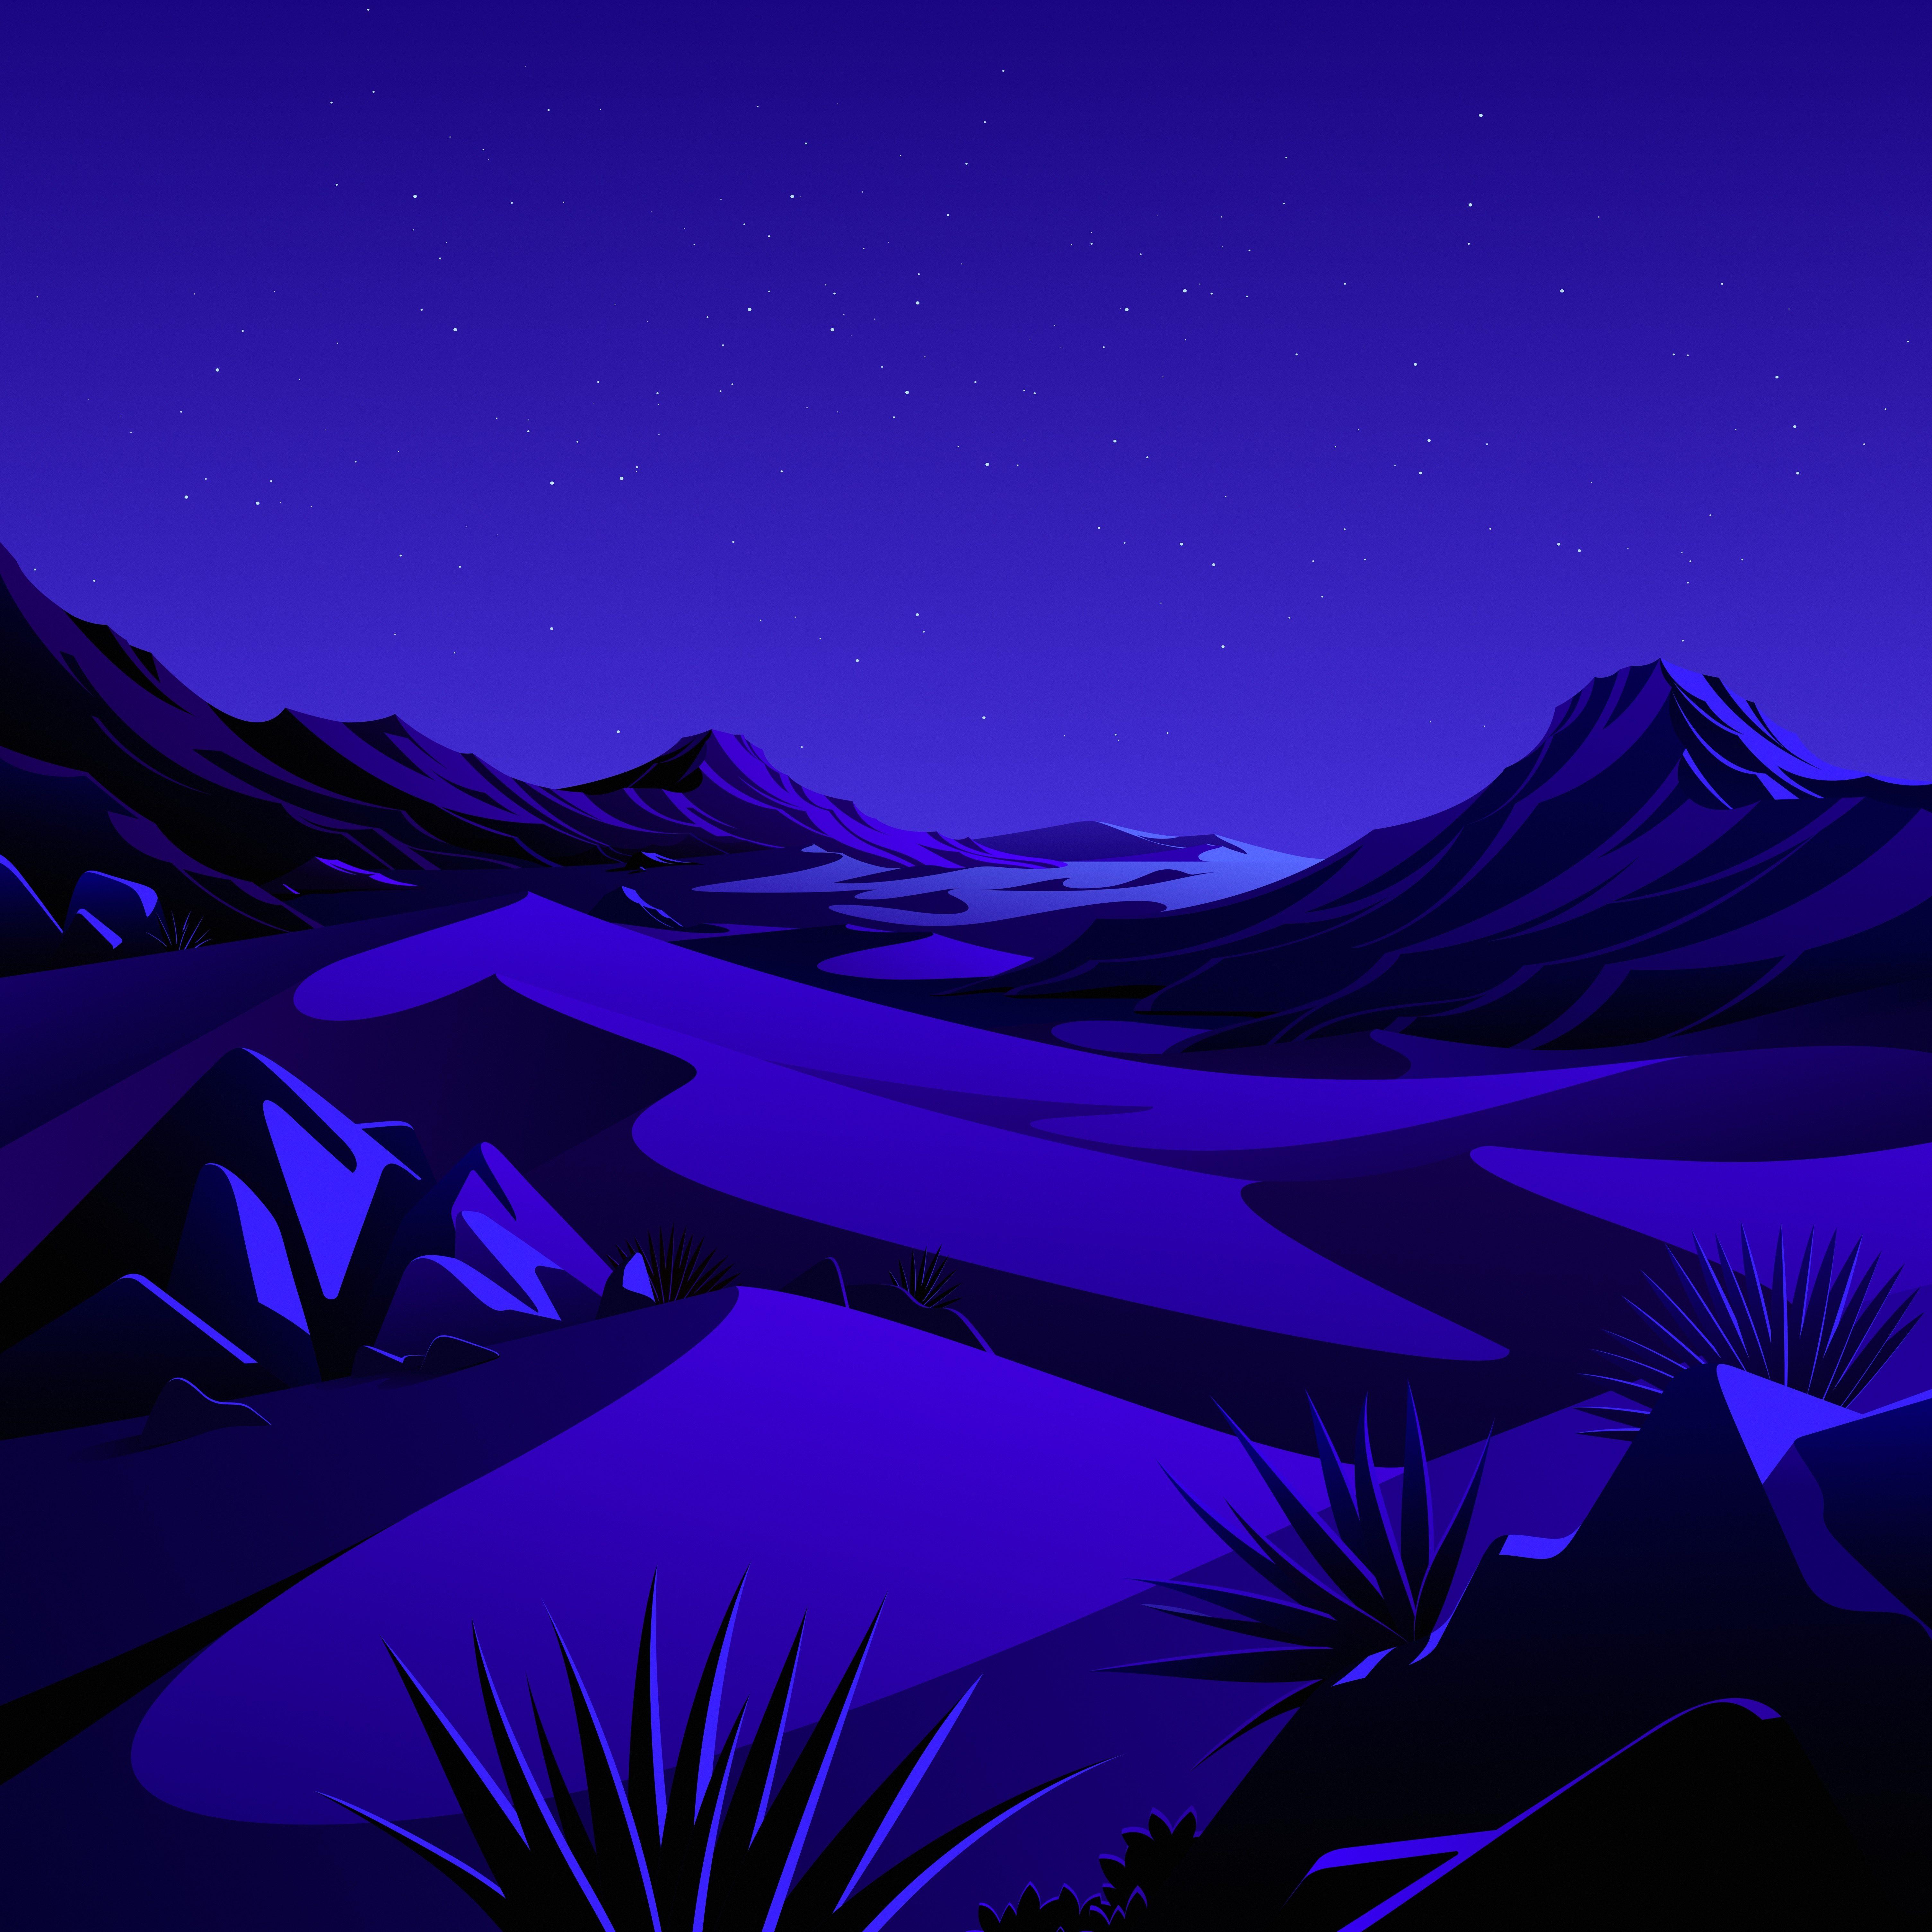 macOS Big Sur The Desert 2 dragged